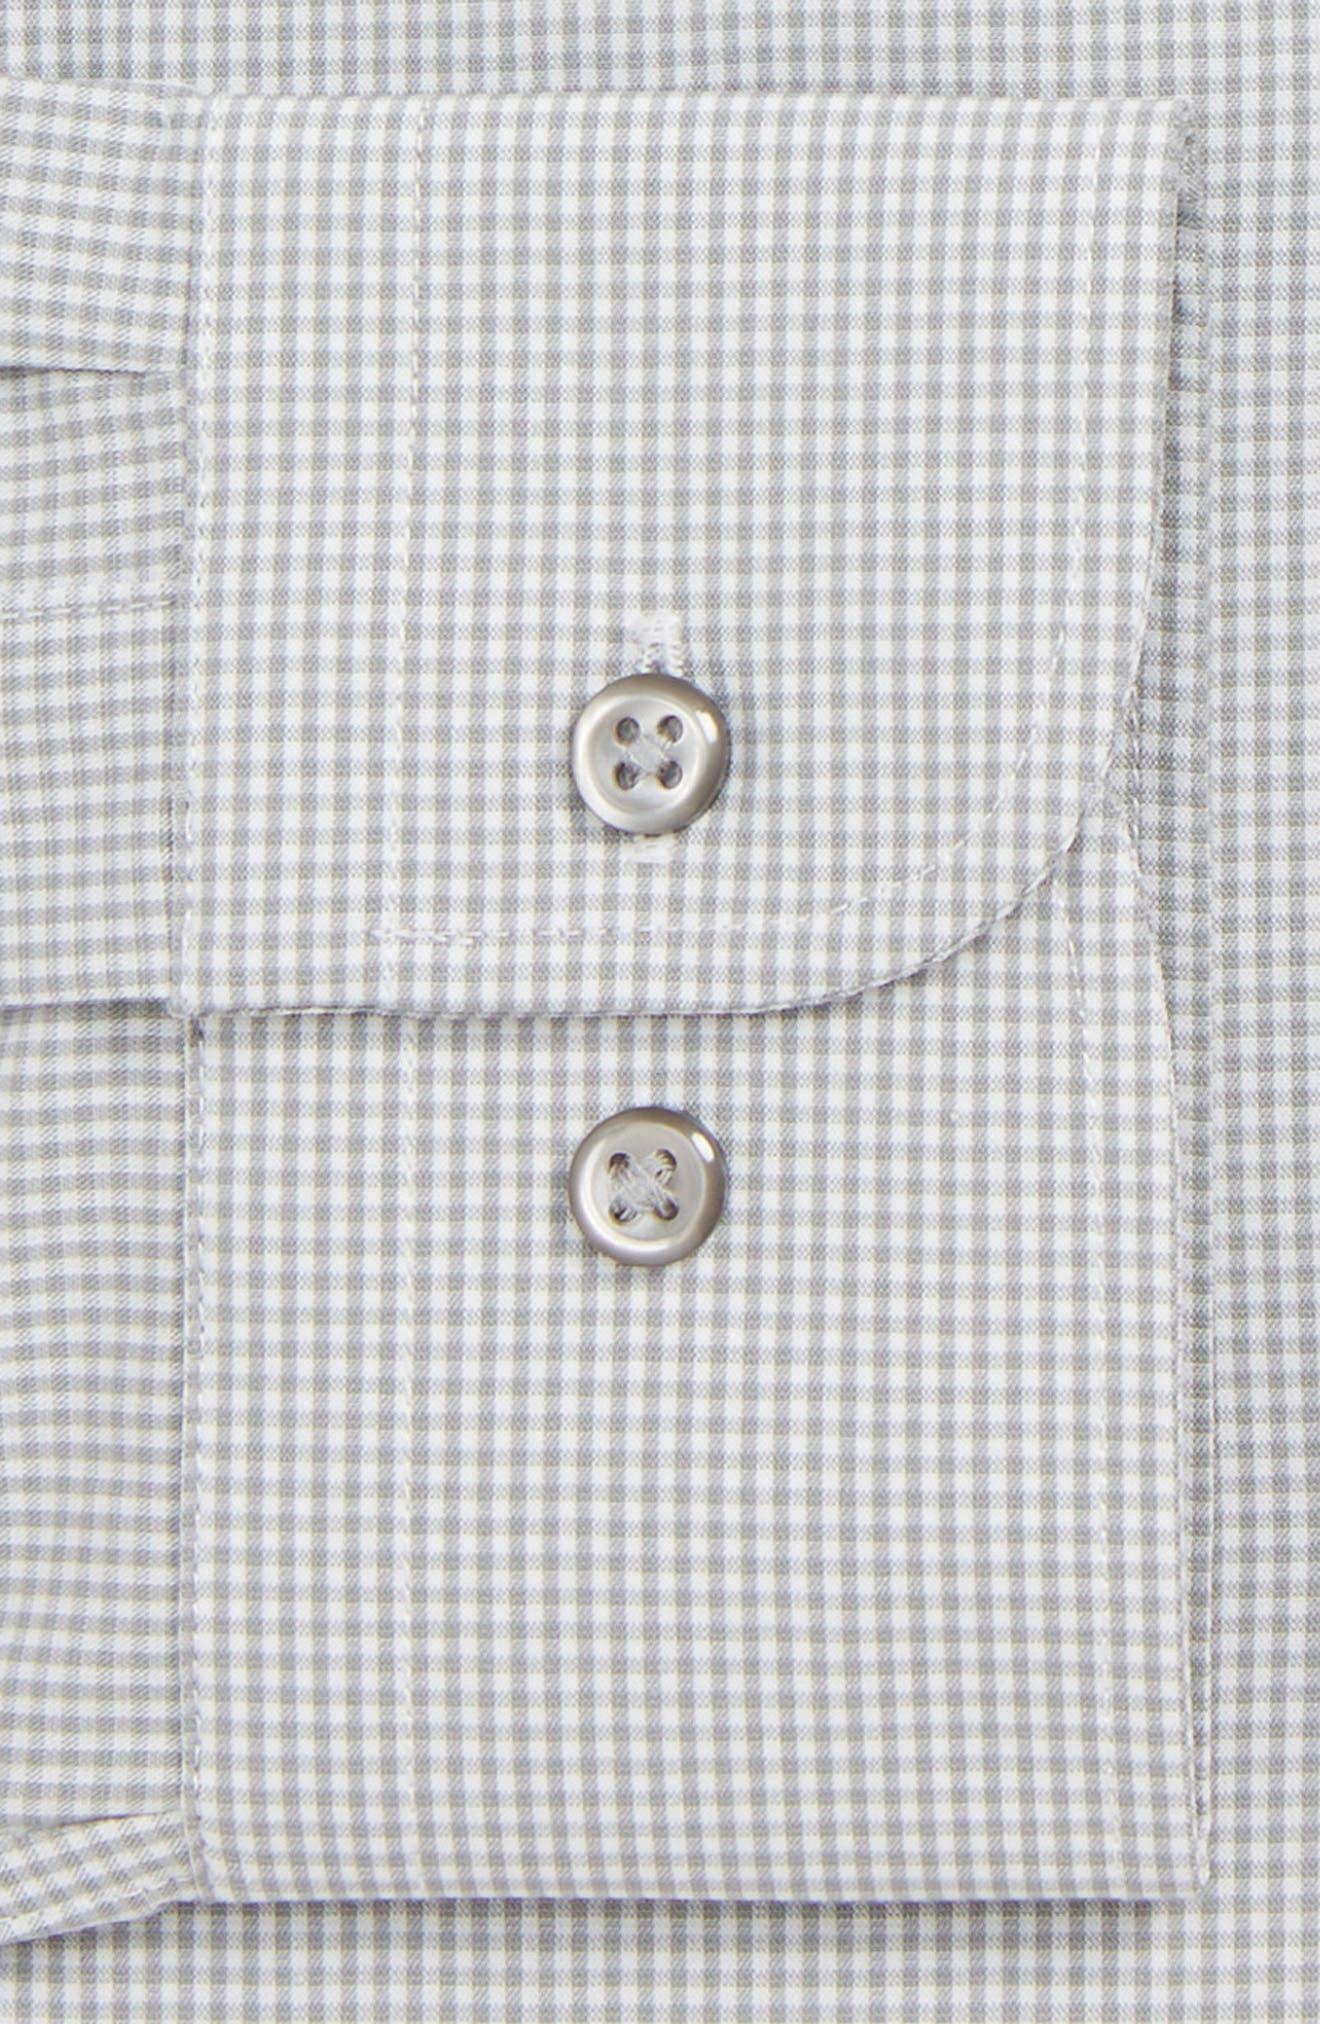 Tech-Smart Trim Fit Stretch Check Dress Shirt,                             Alternate thumbnail 2, color,                             GREY SLEET